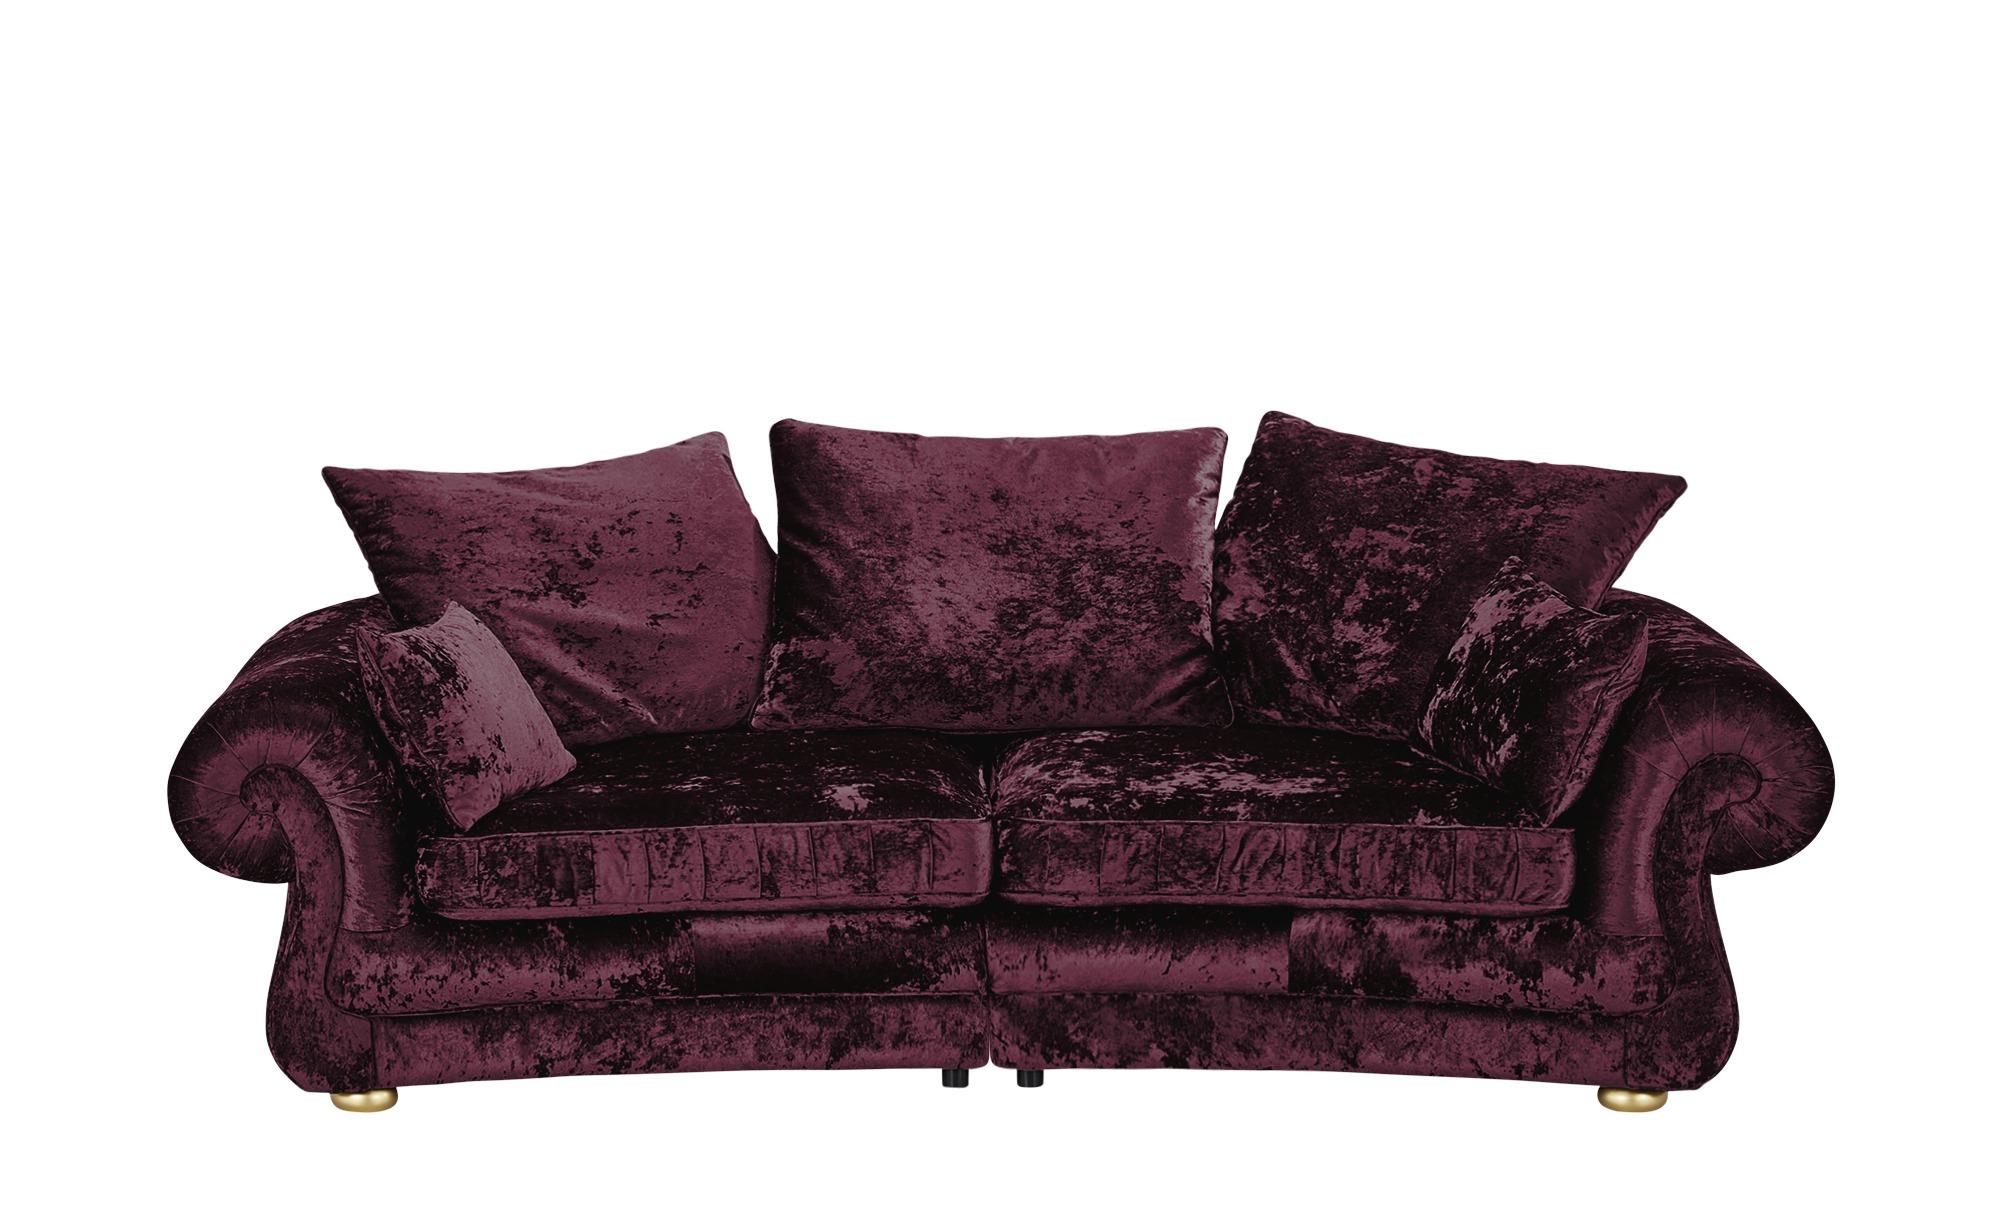 Megasofa  Sensation ¦ lila/violett ¦ Maße (cm): B: 280 H: 82 T: 135 Polstermöbel > Sofas > Einzelsofas - Höffner